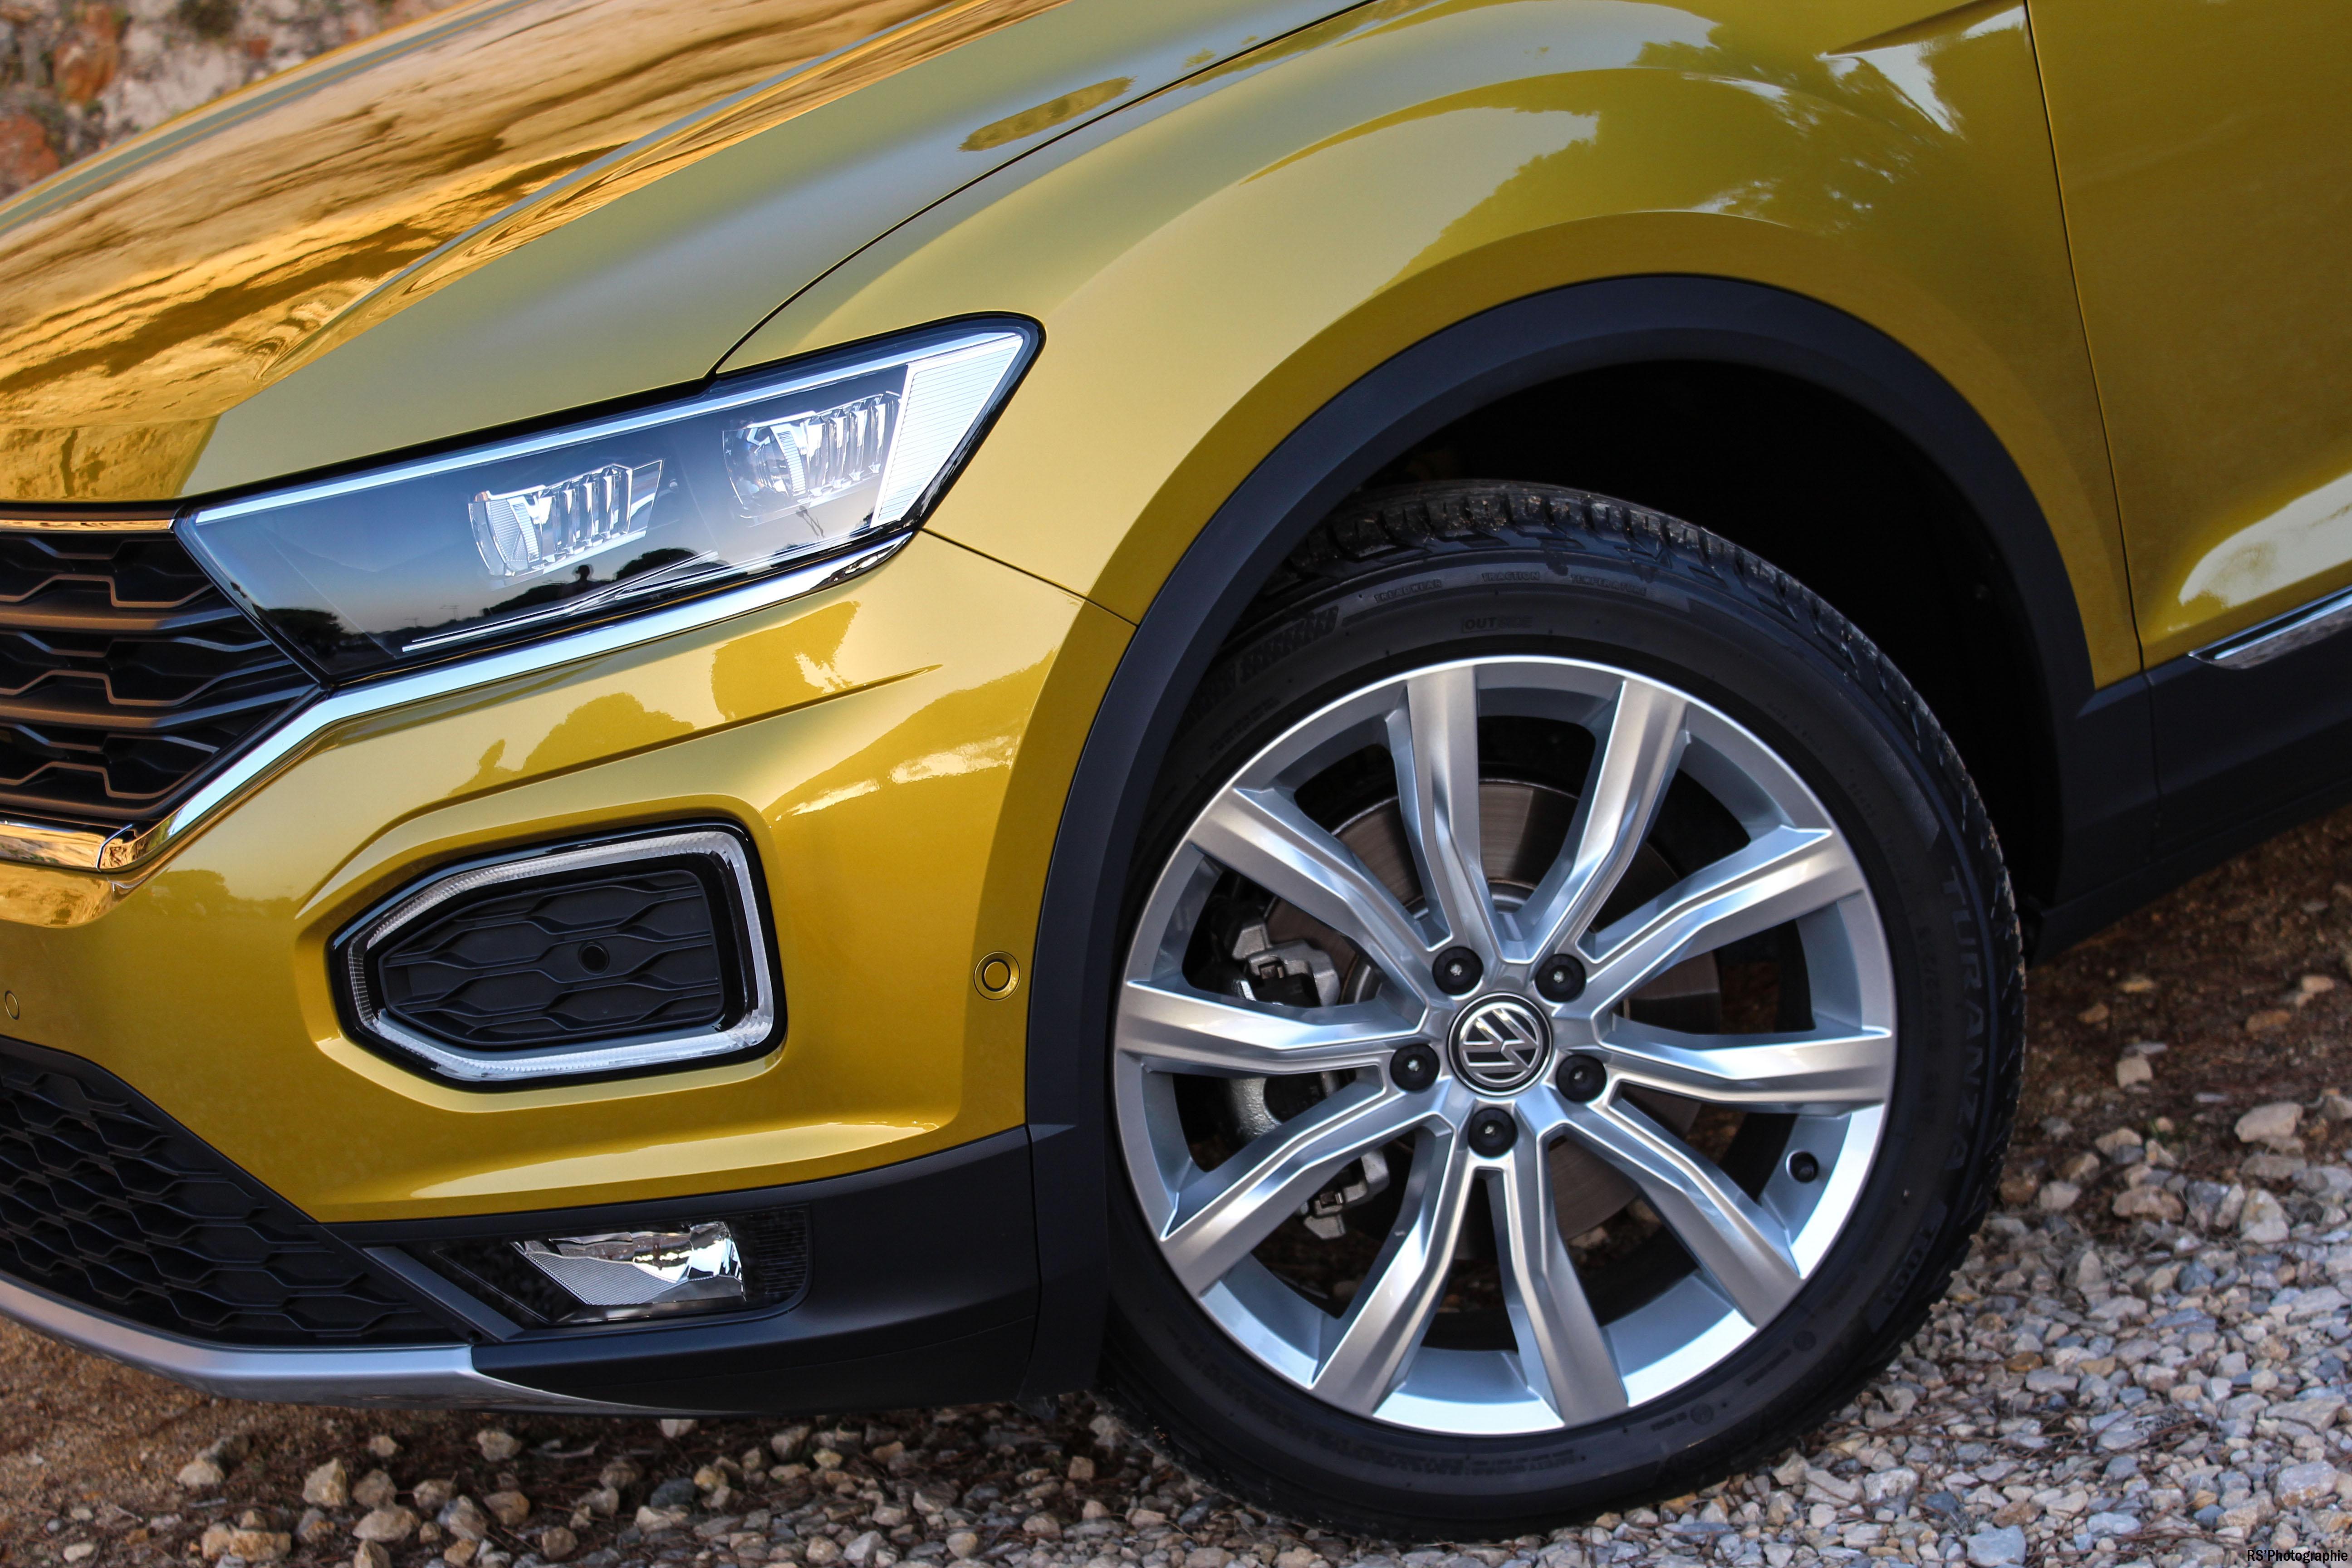 Volkswagentroc66-vw-t-roc-avant-front-Arnaud Demasier-RSPhotographie